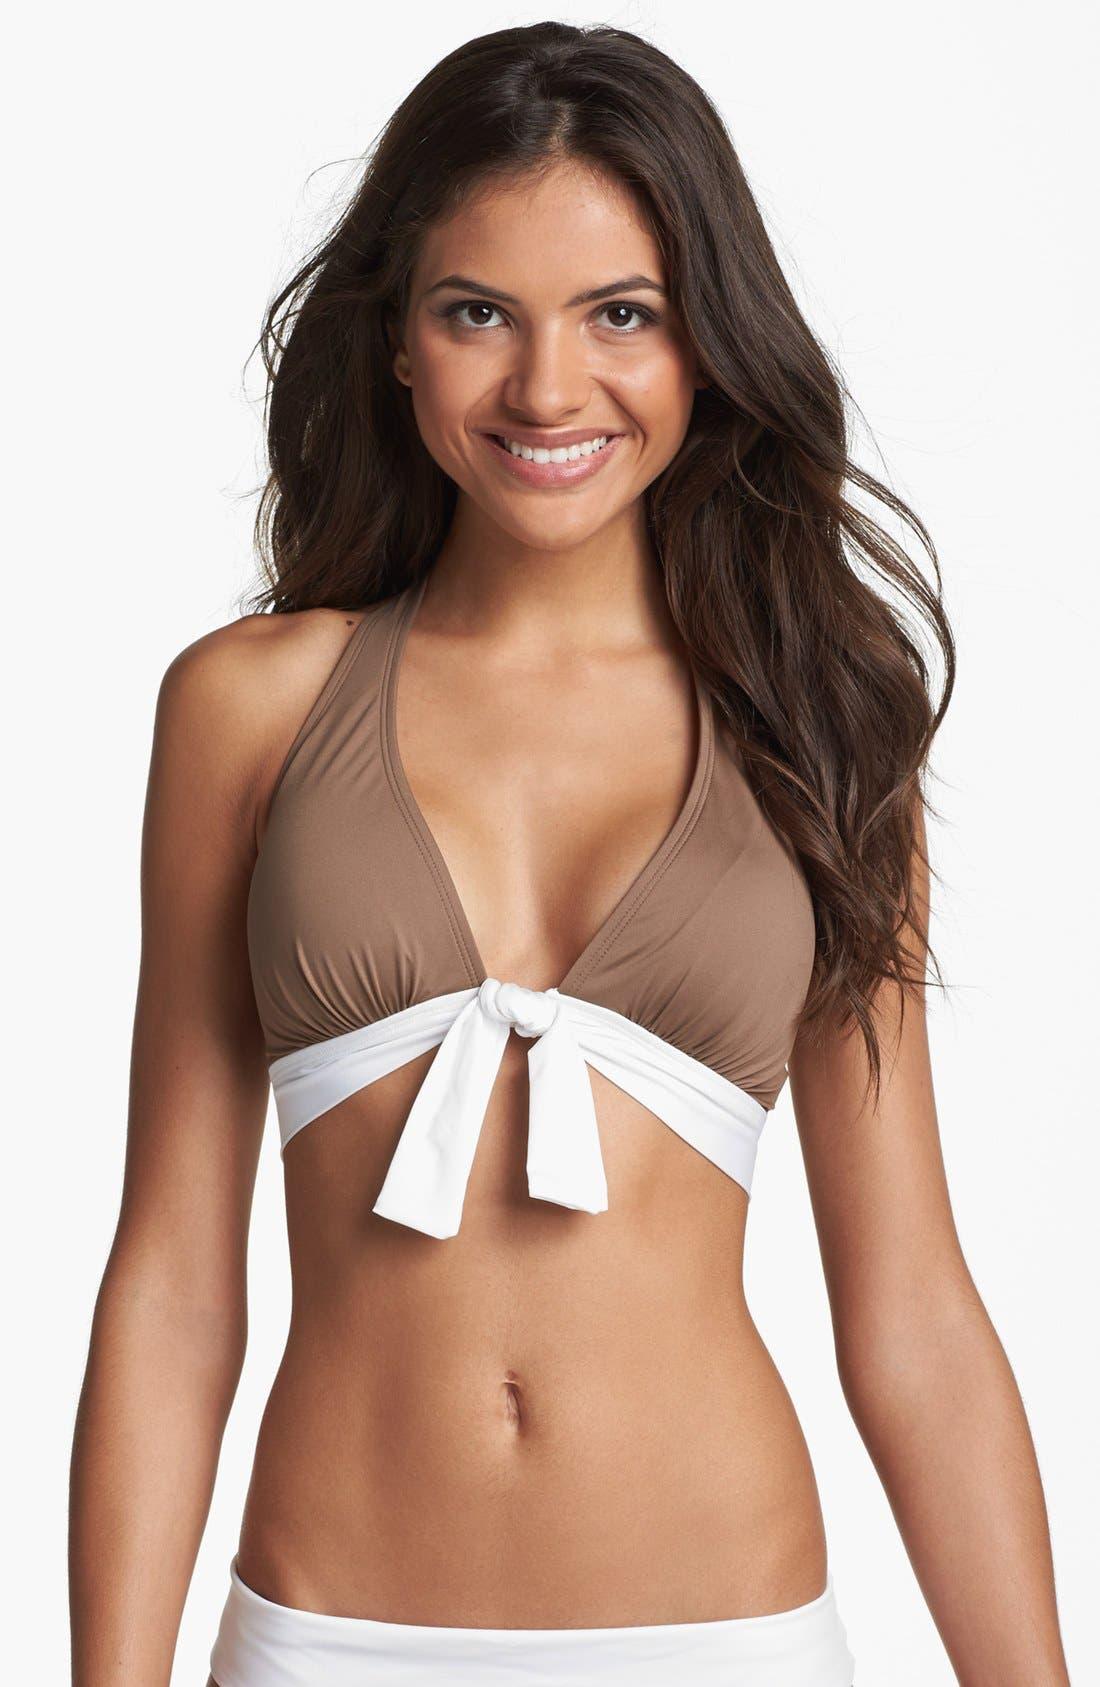 Alternate Image 1 Selected - Tommy Bahama 'Deck Piping' Halter Bikini Top